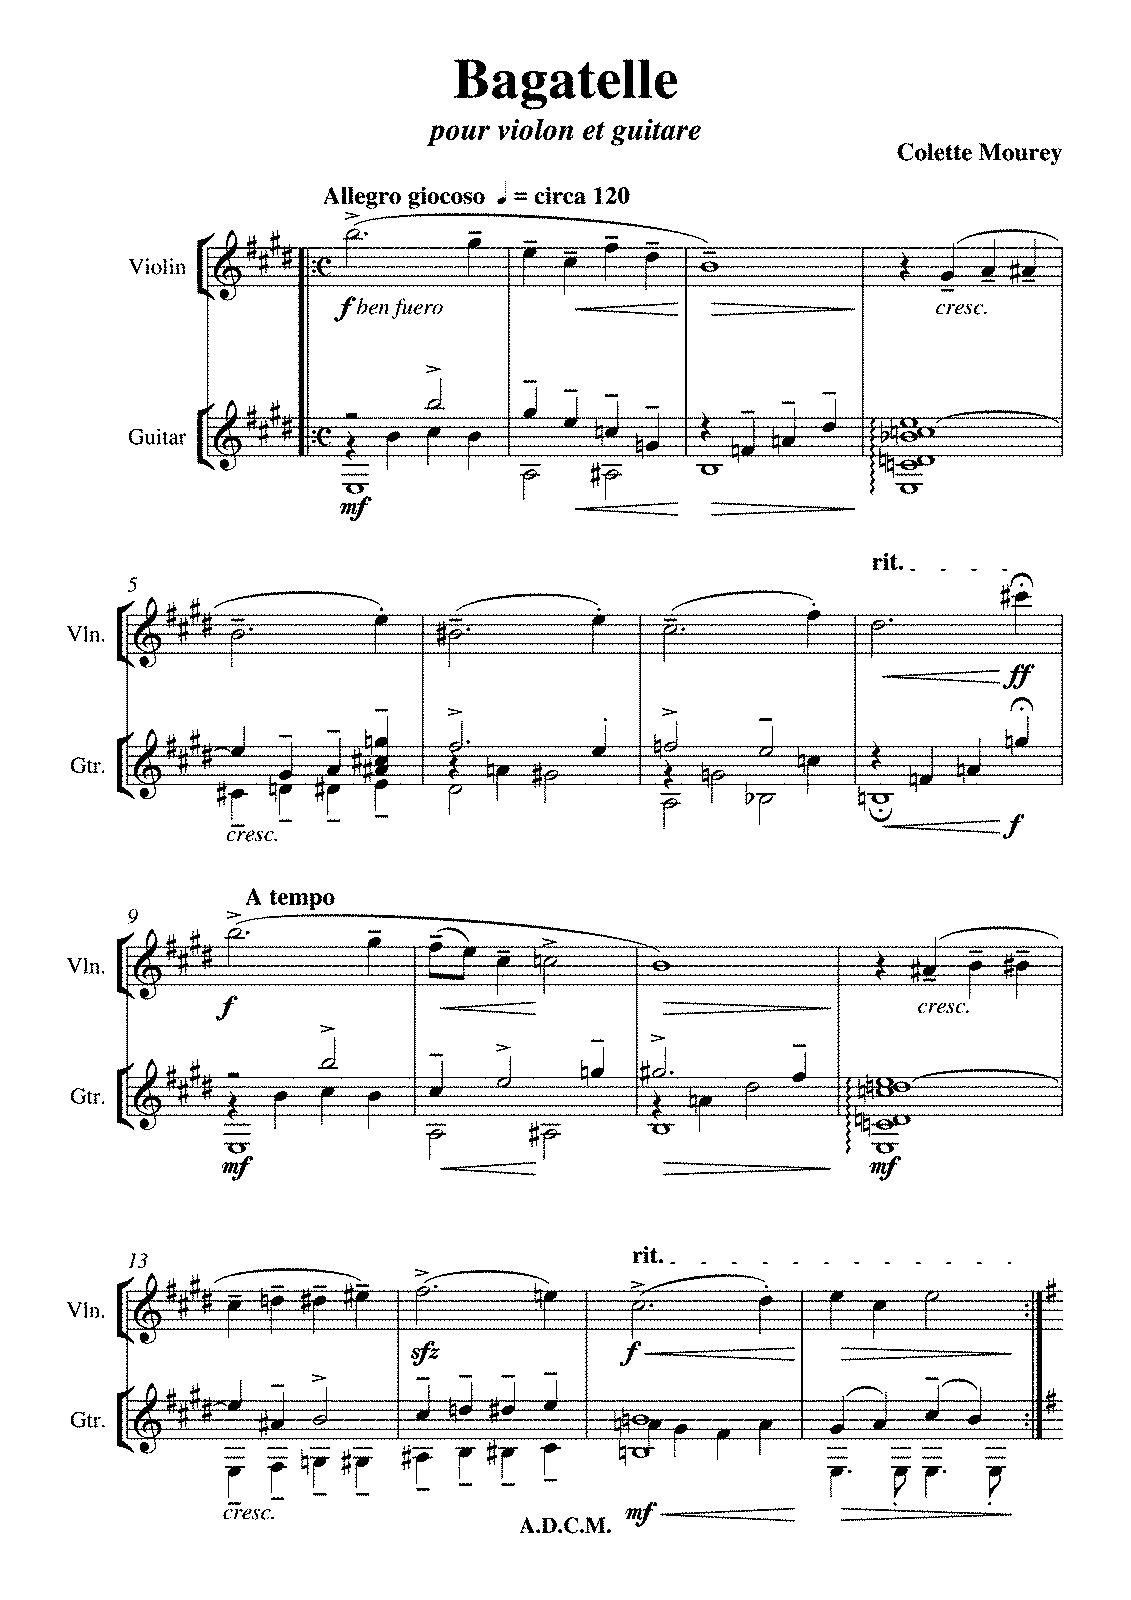 Bagatelle (Mourey, Colette) - IMSLP/Petrucci Music Library: Free